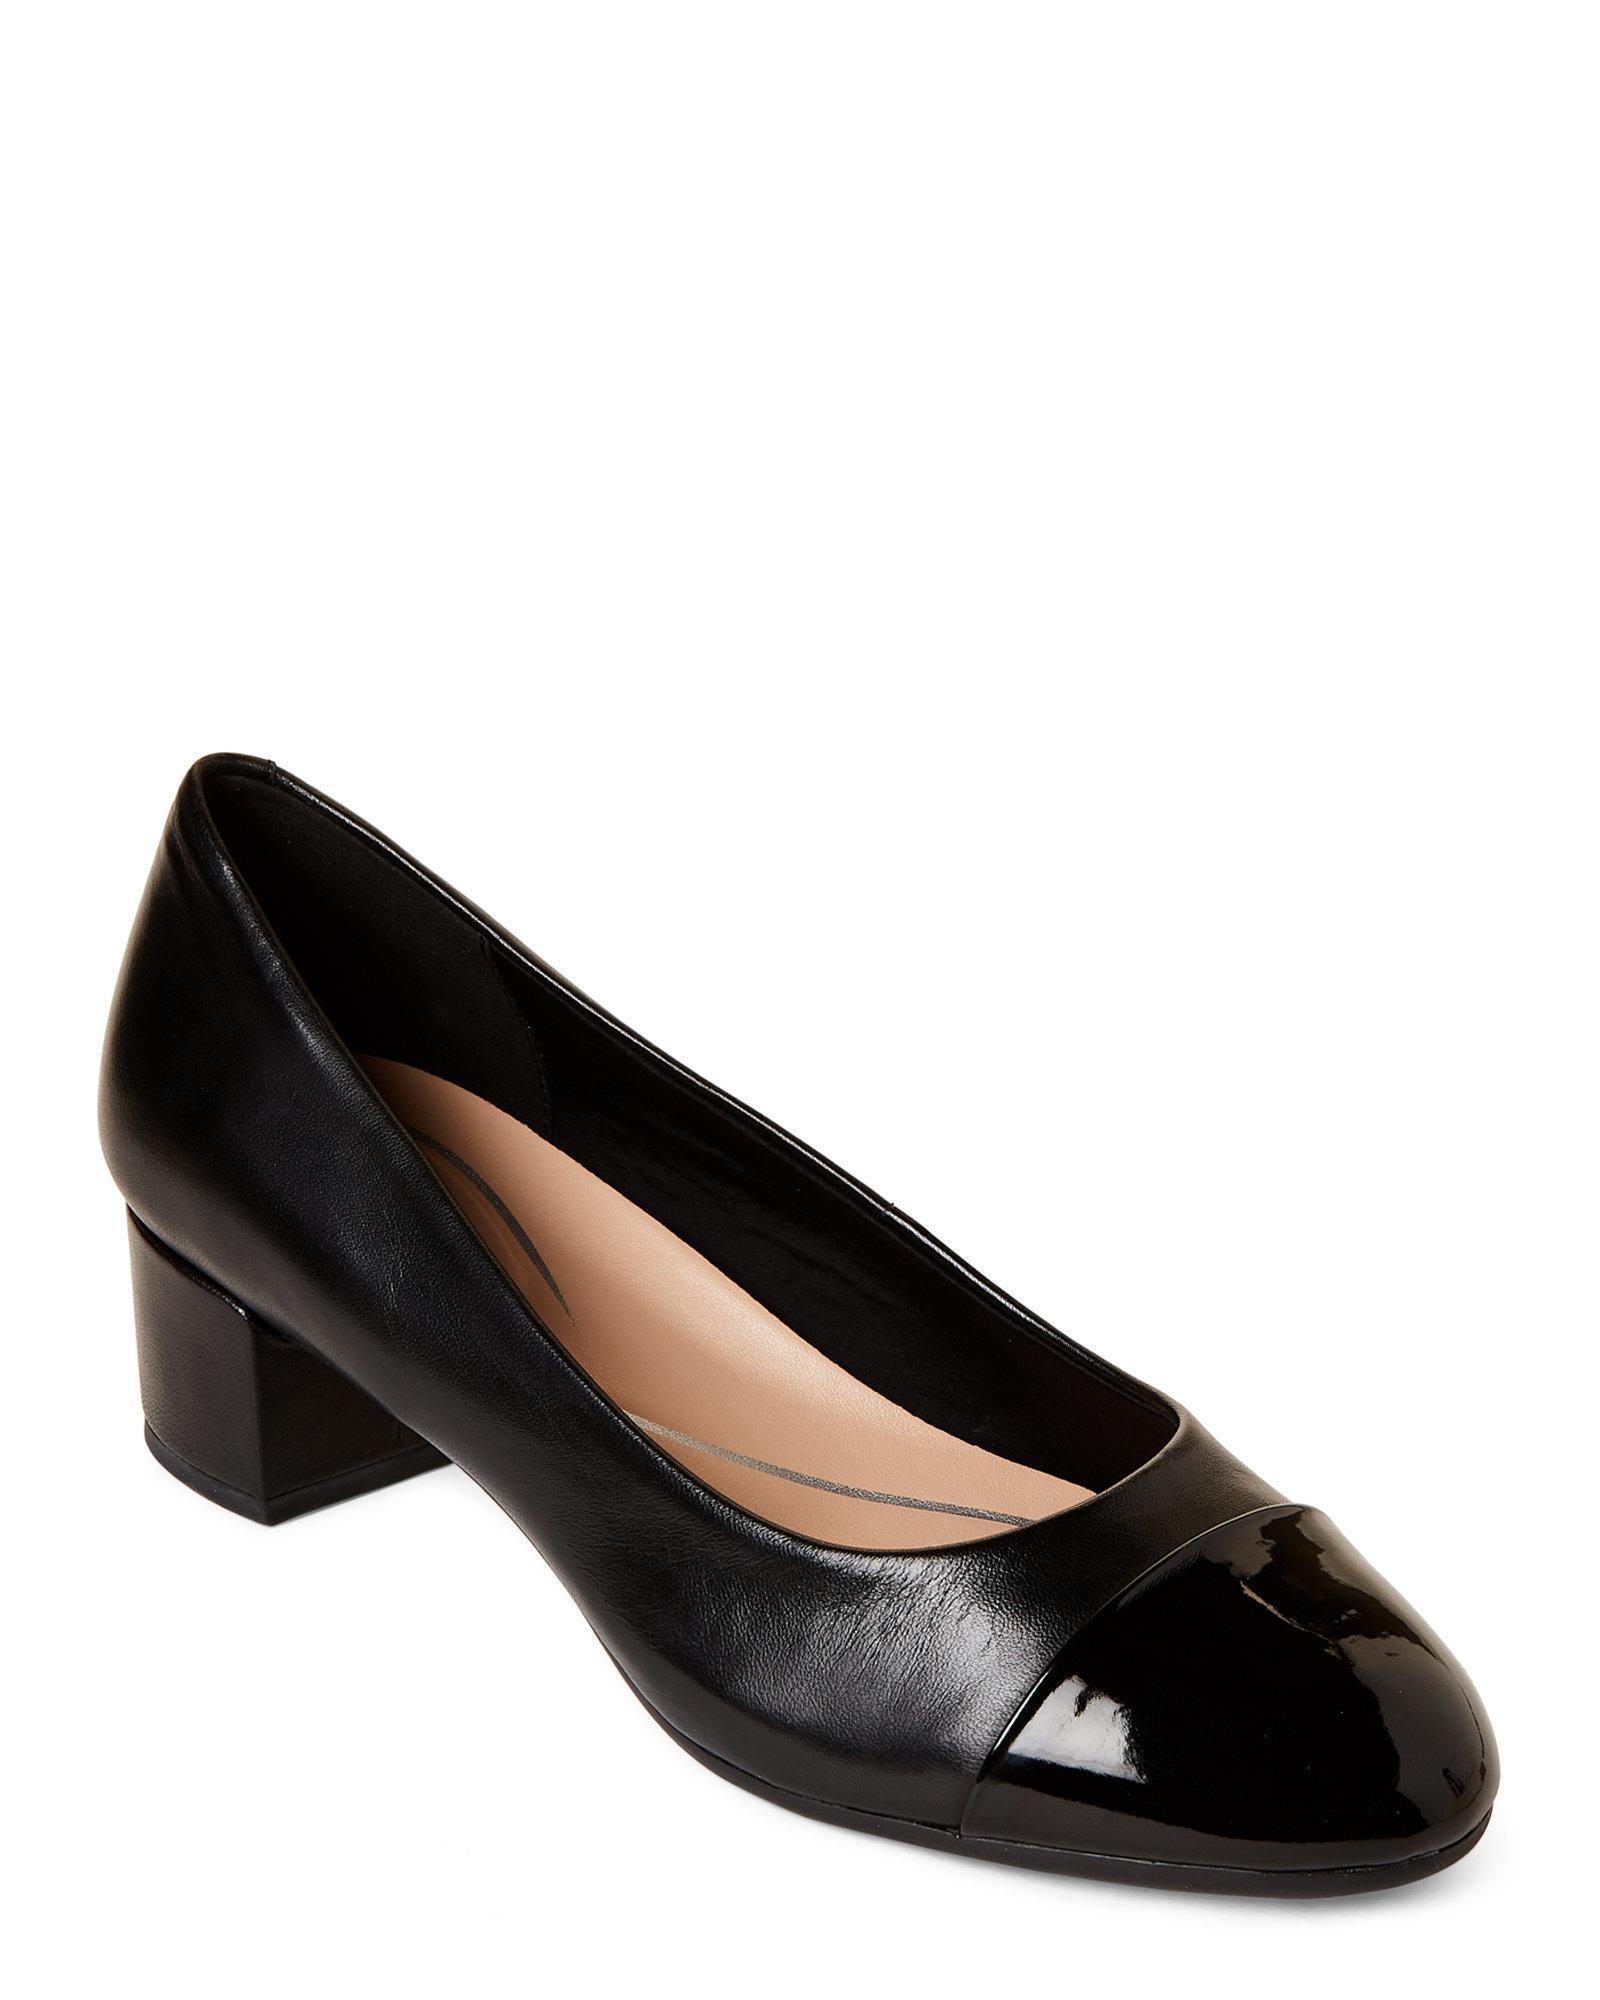 70686ba5431 Lyst - Easy Spirit Black Apricot Leather Pumps in Black